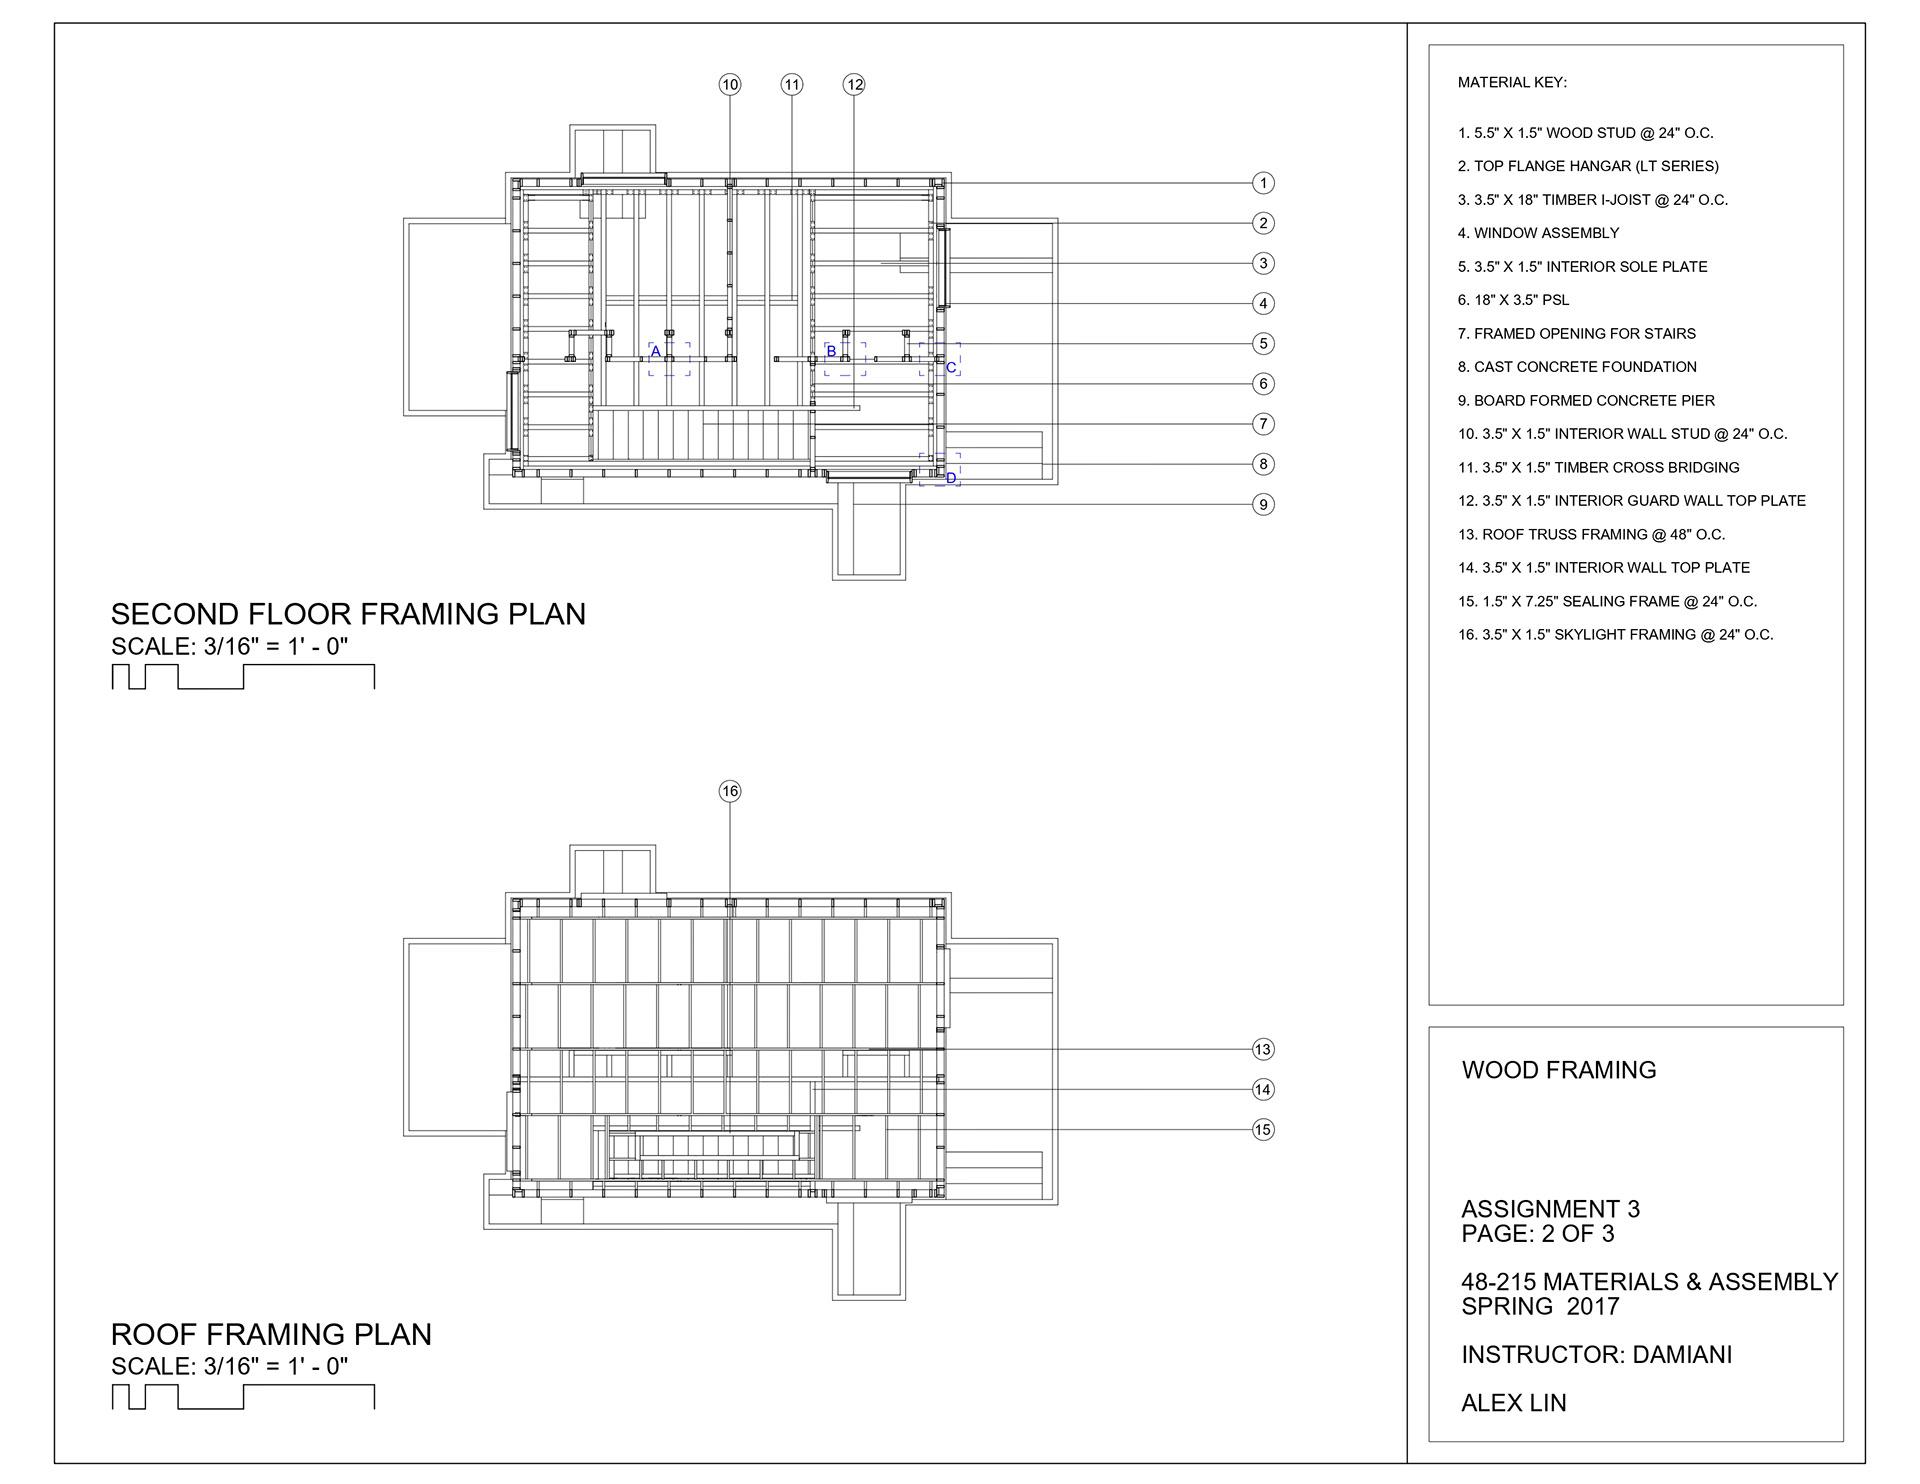 Alex Lin Materials Assembly